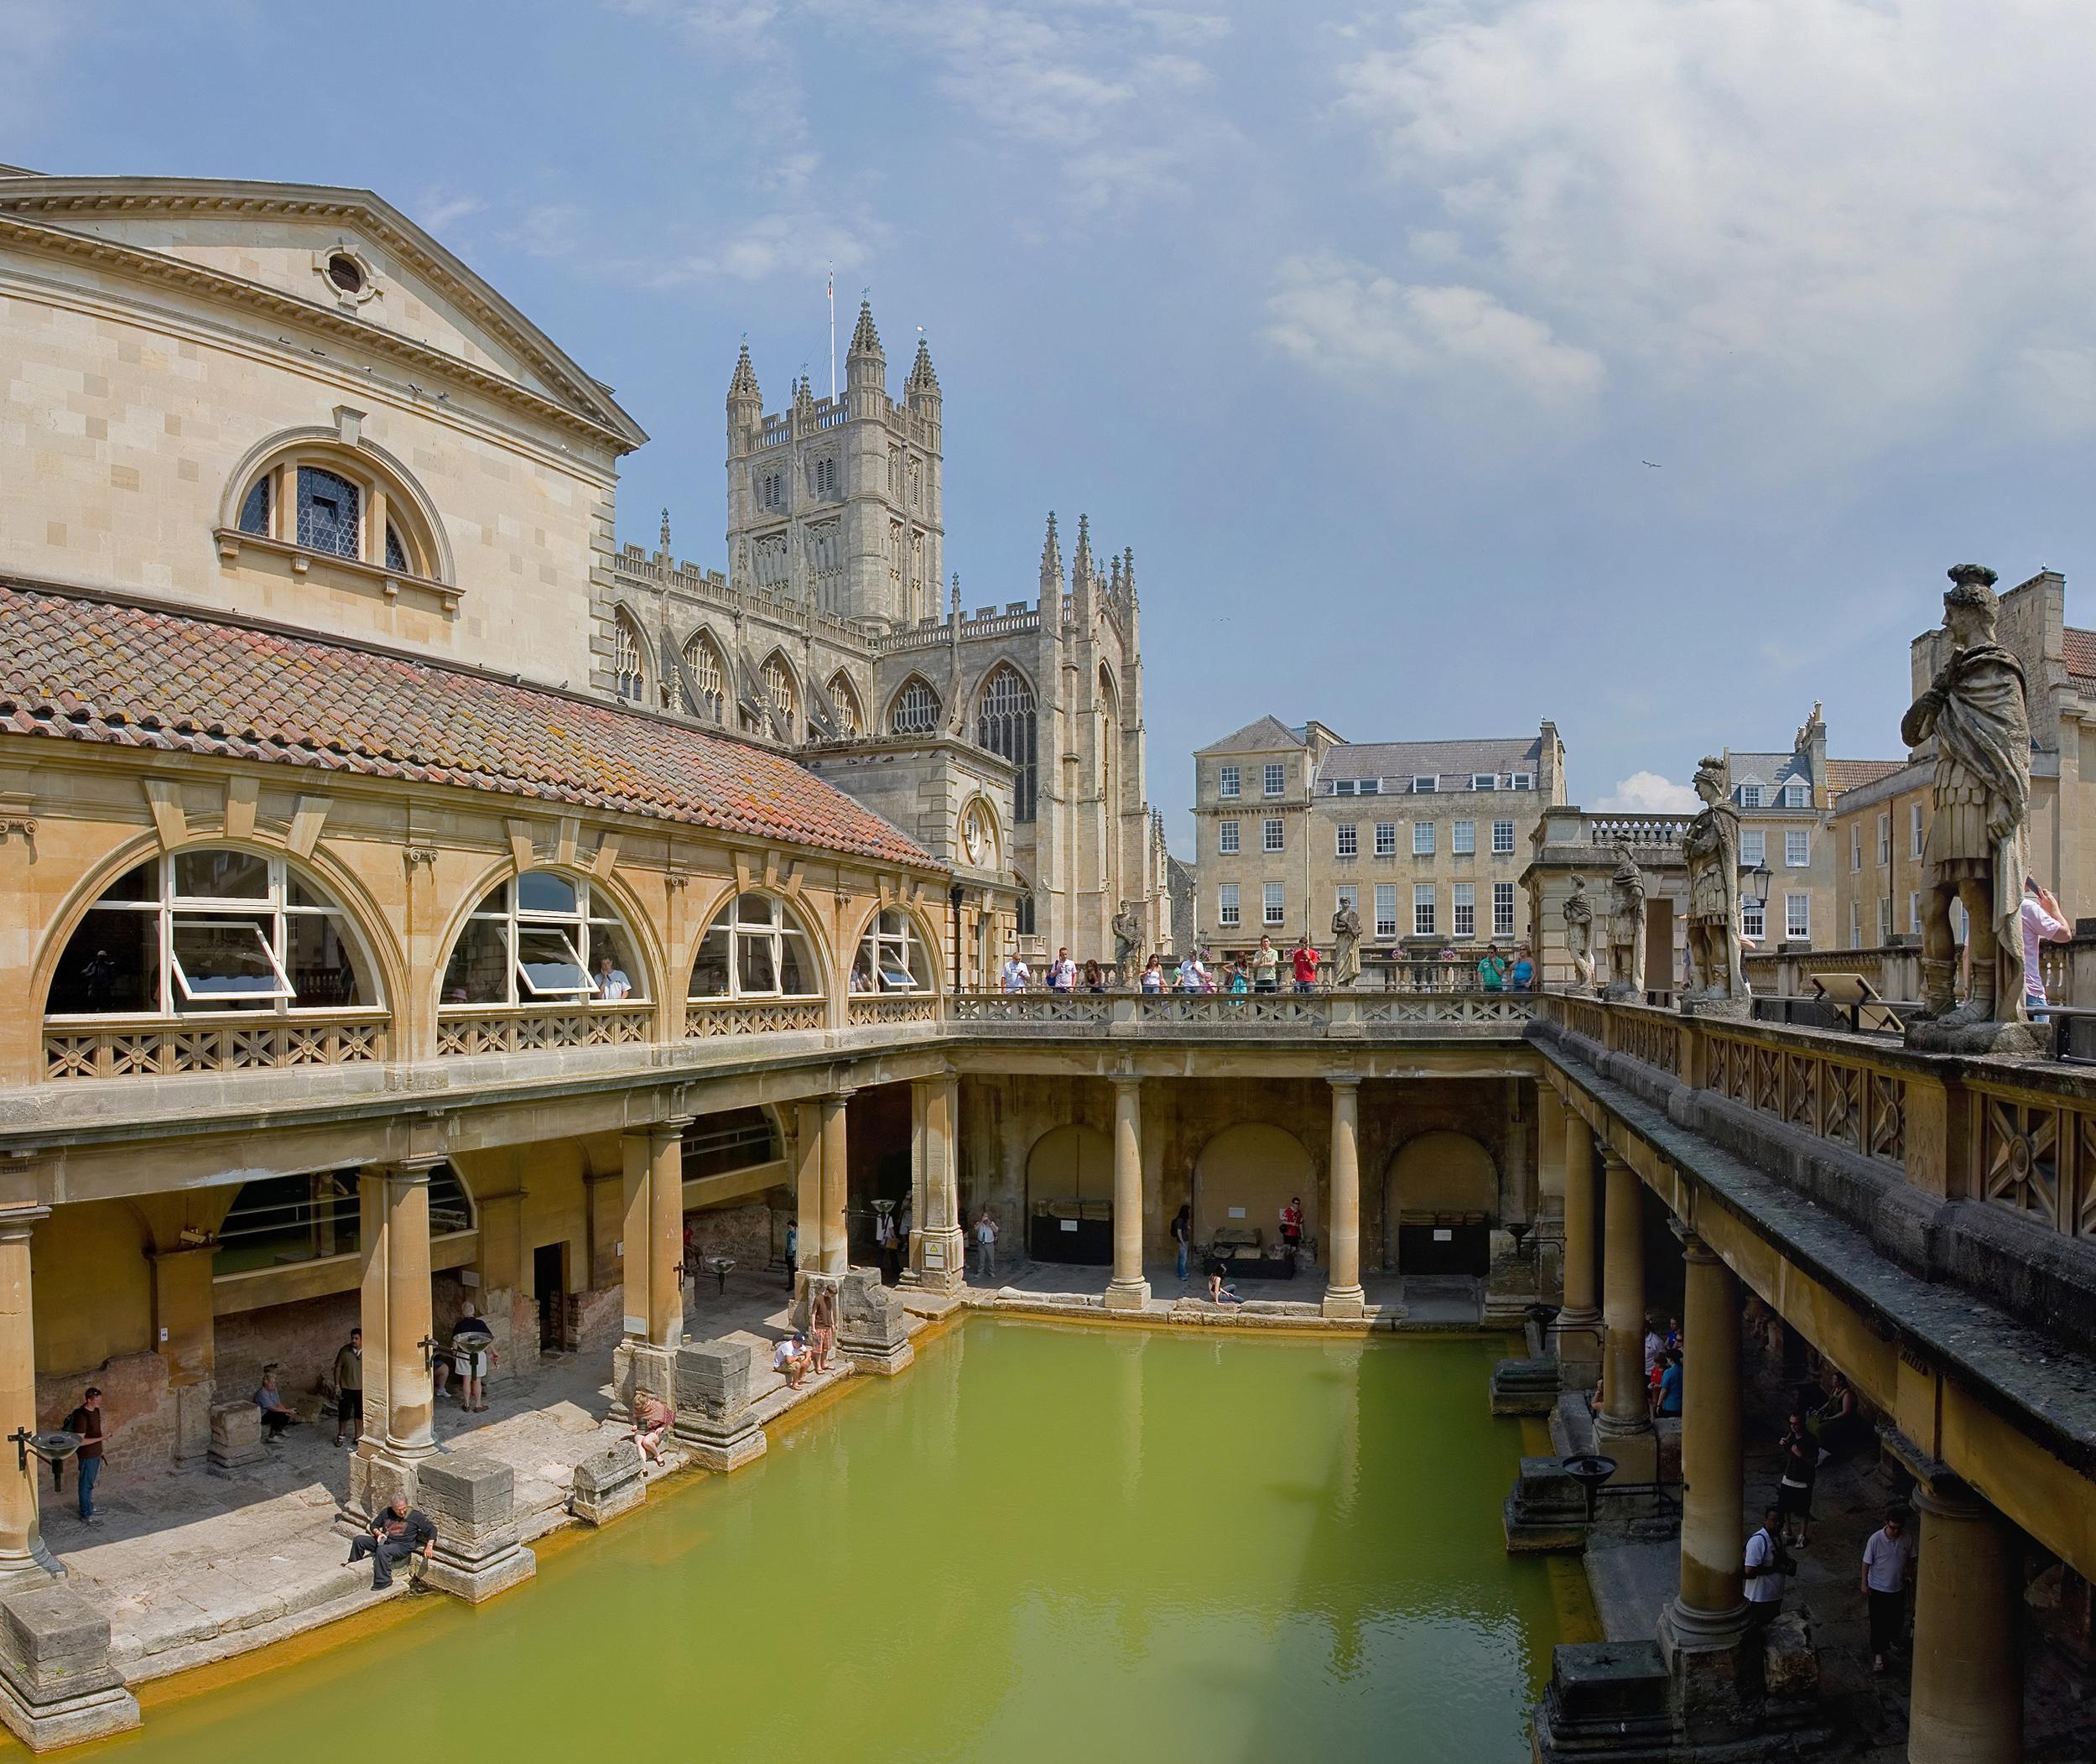 Roman_Baths_(Bath)